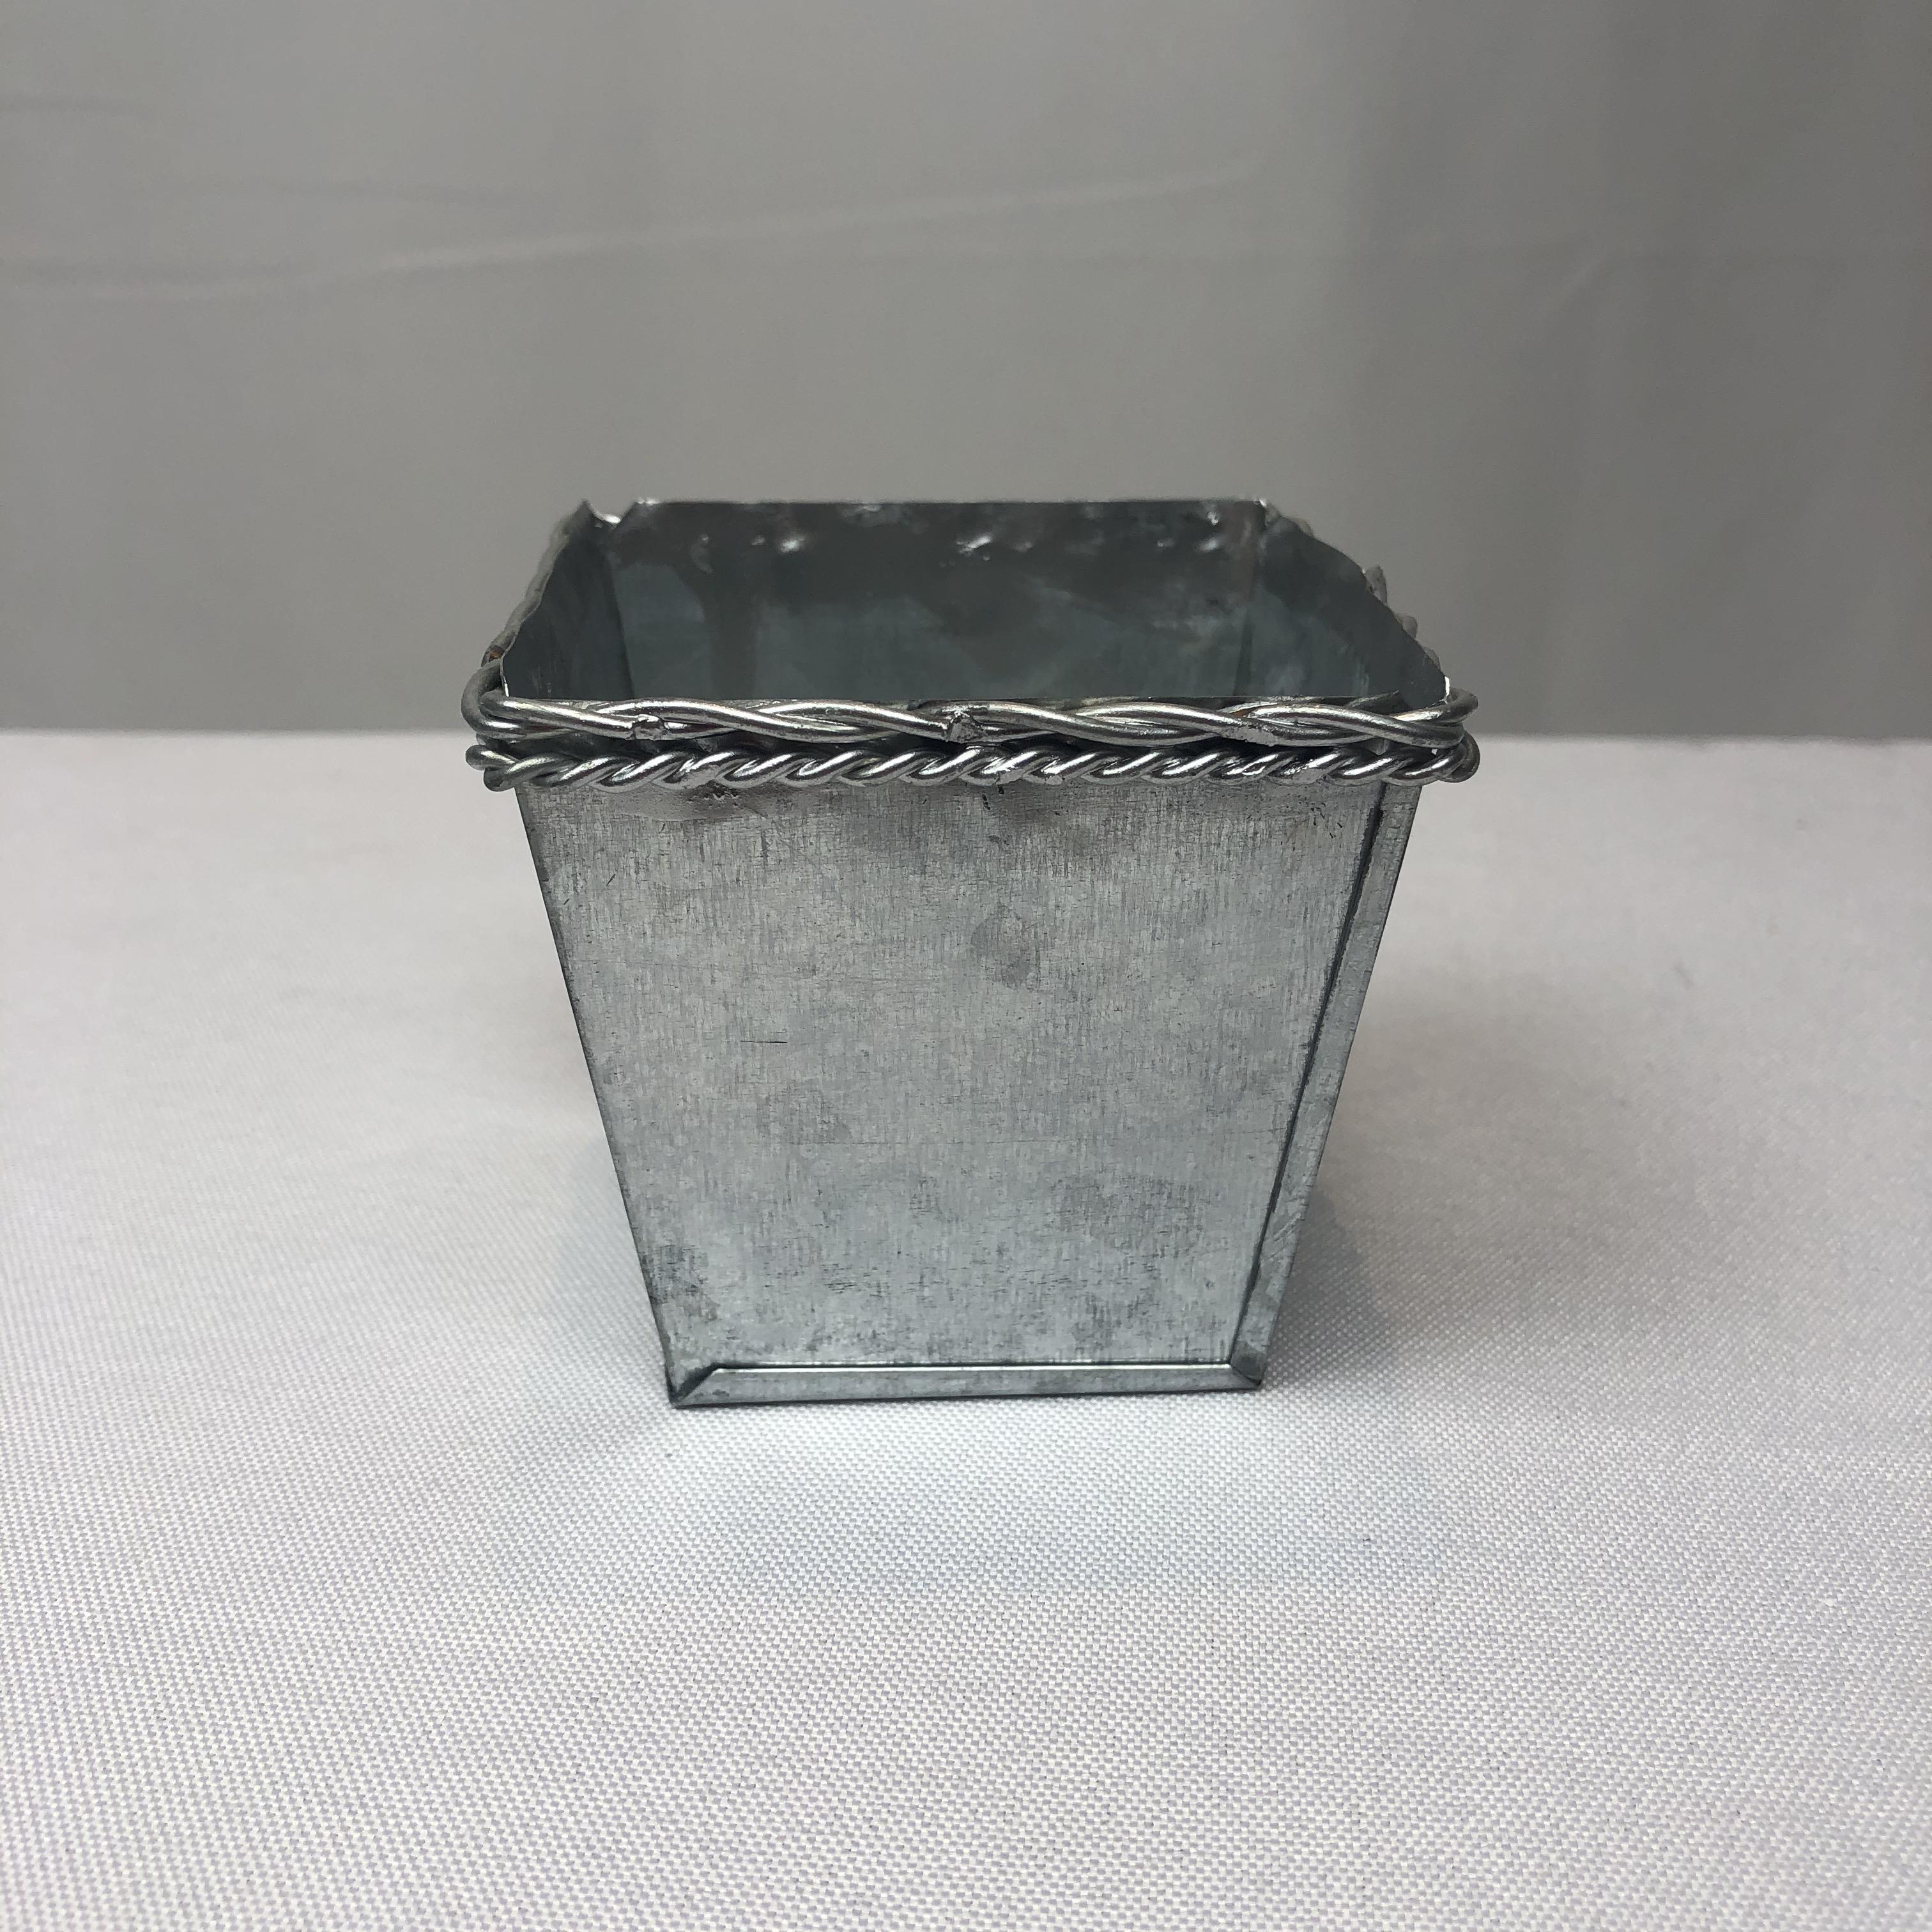 D7.5XH7CMの小型多肉植物鍋銀色保育園プランター正方形の電流を通された結婚式の好意